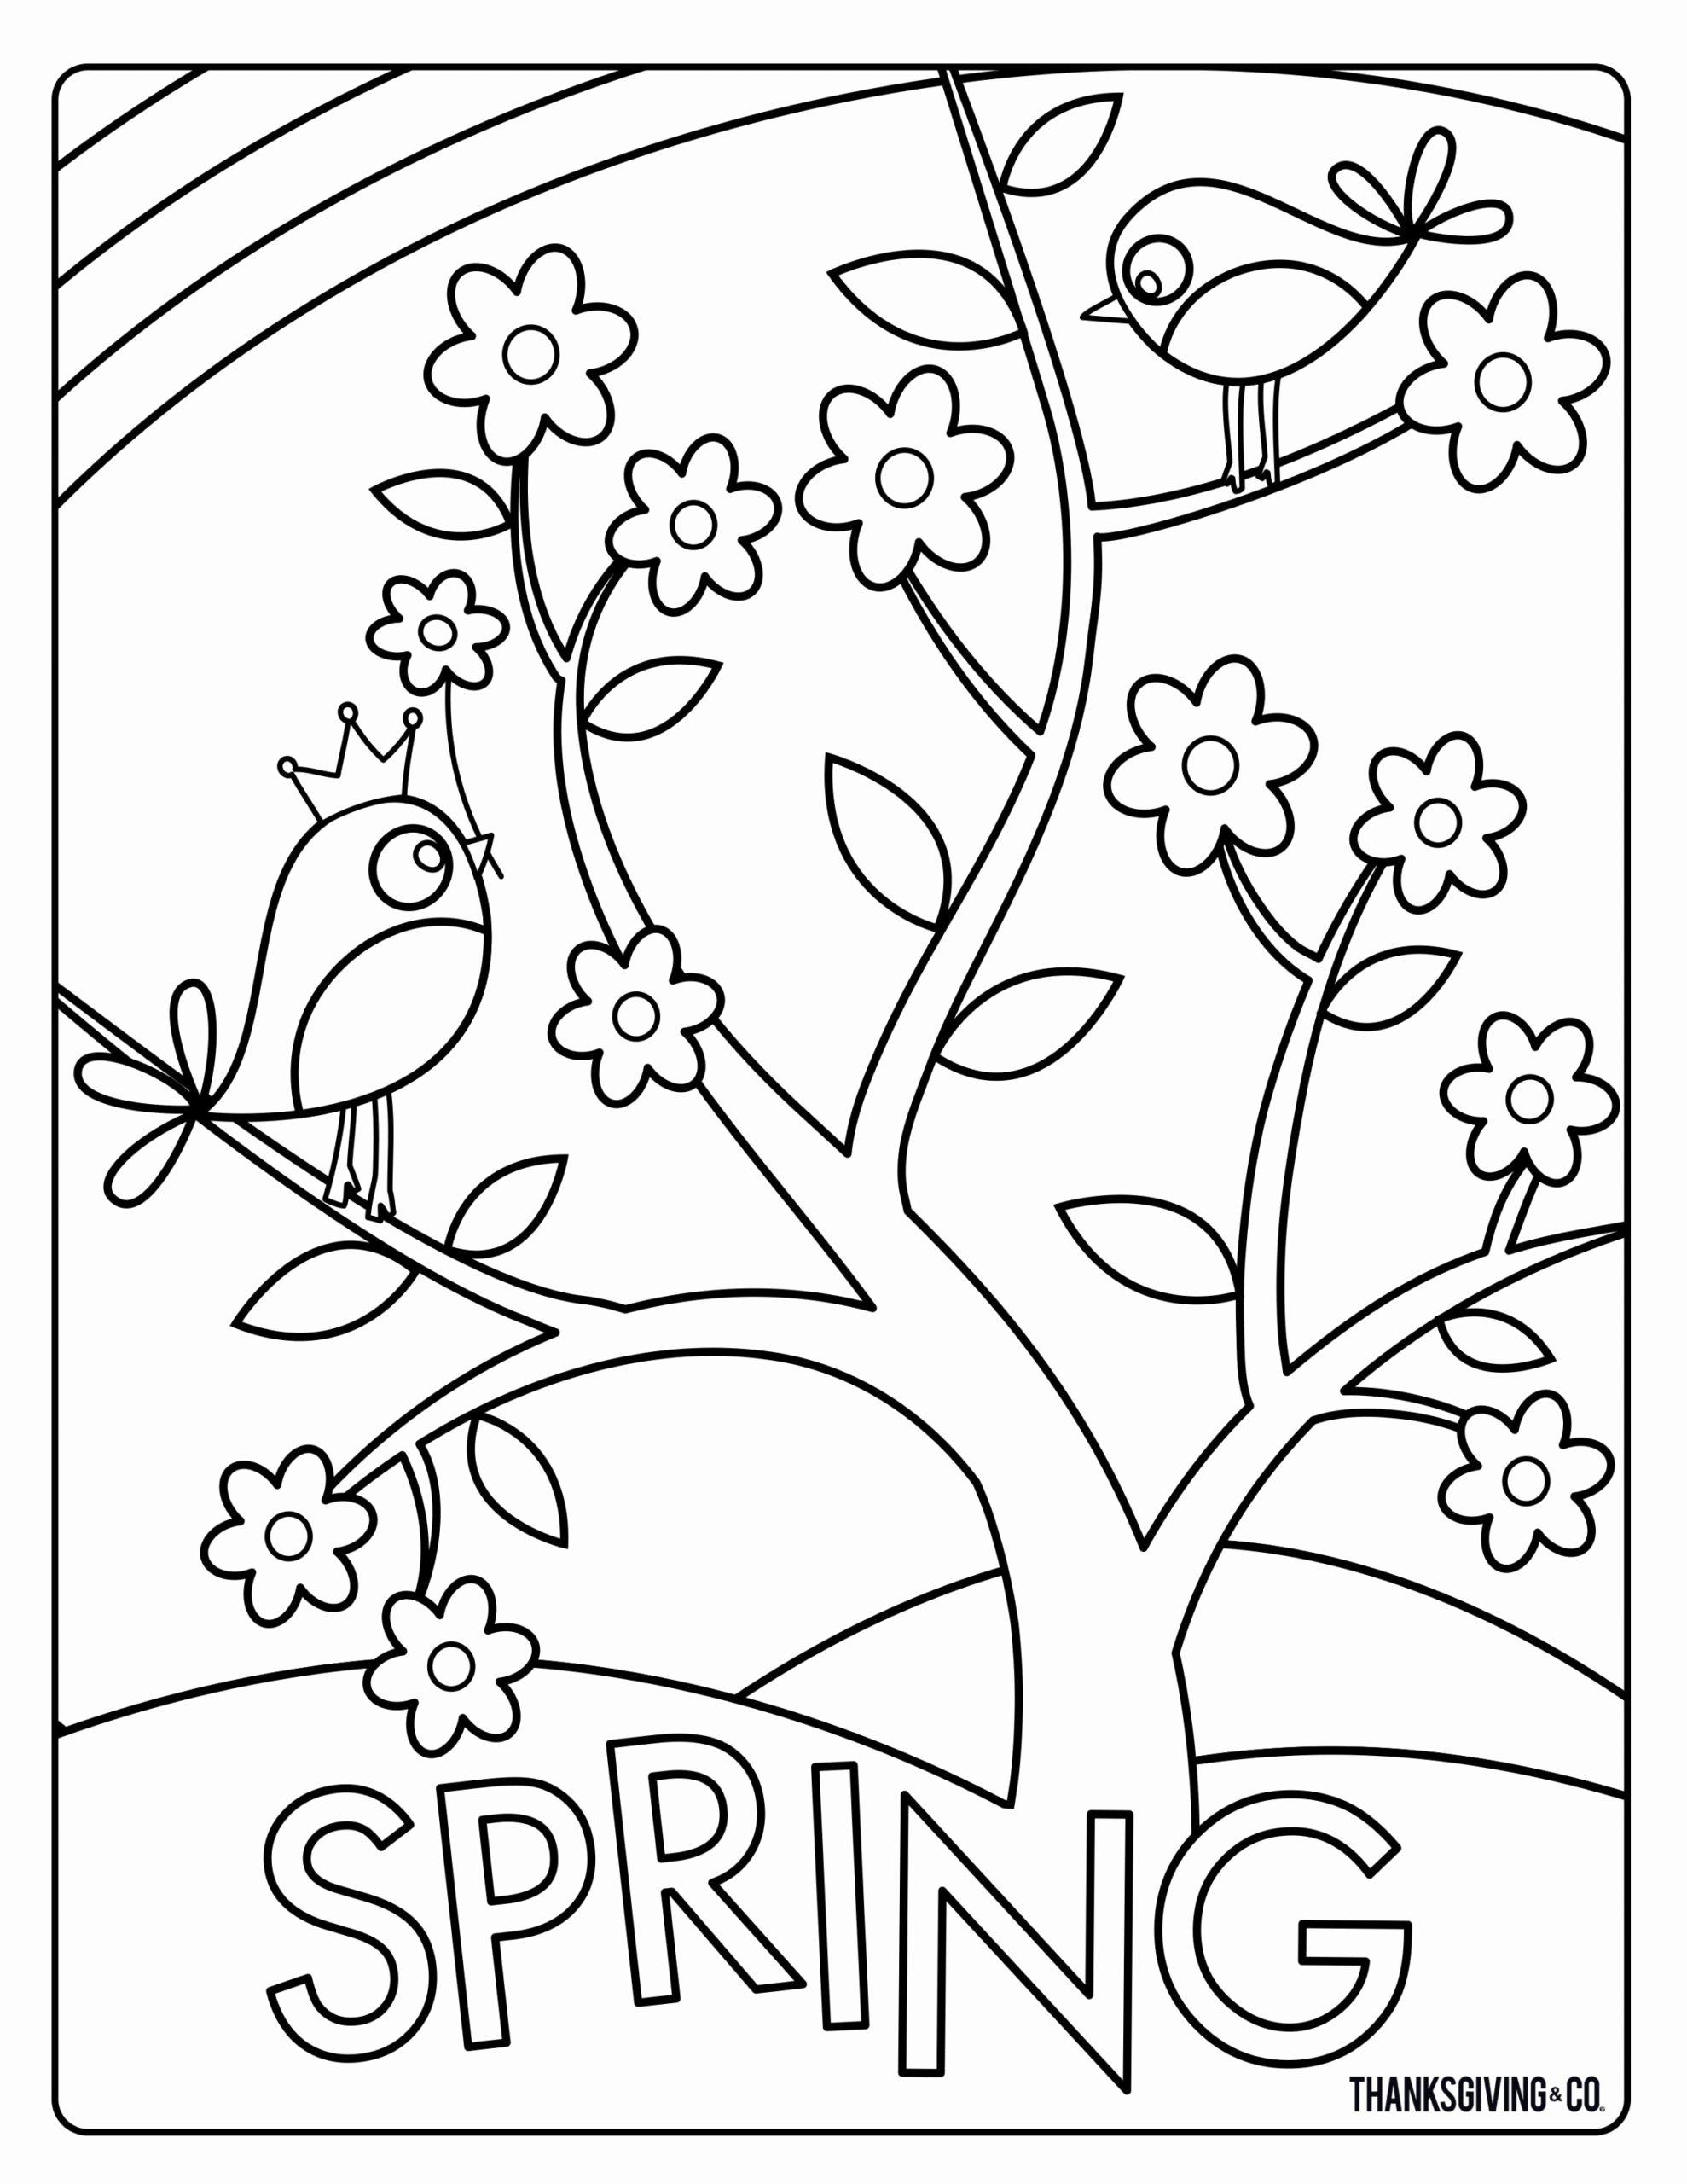 Spring Coloring Worksheets for Preschoolers Best Of Spring Coloring Sheets for toddlers Coloringheets Happy Kids